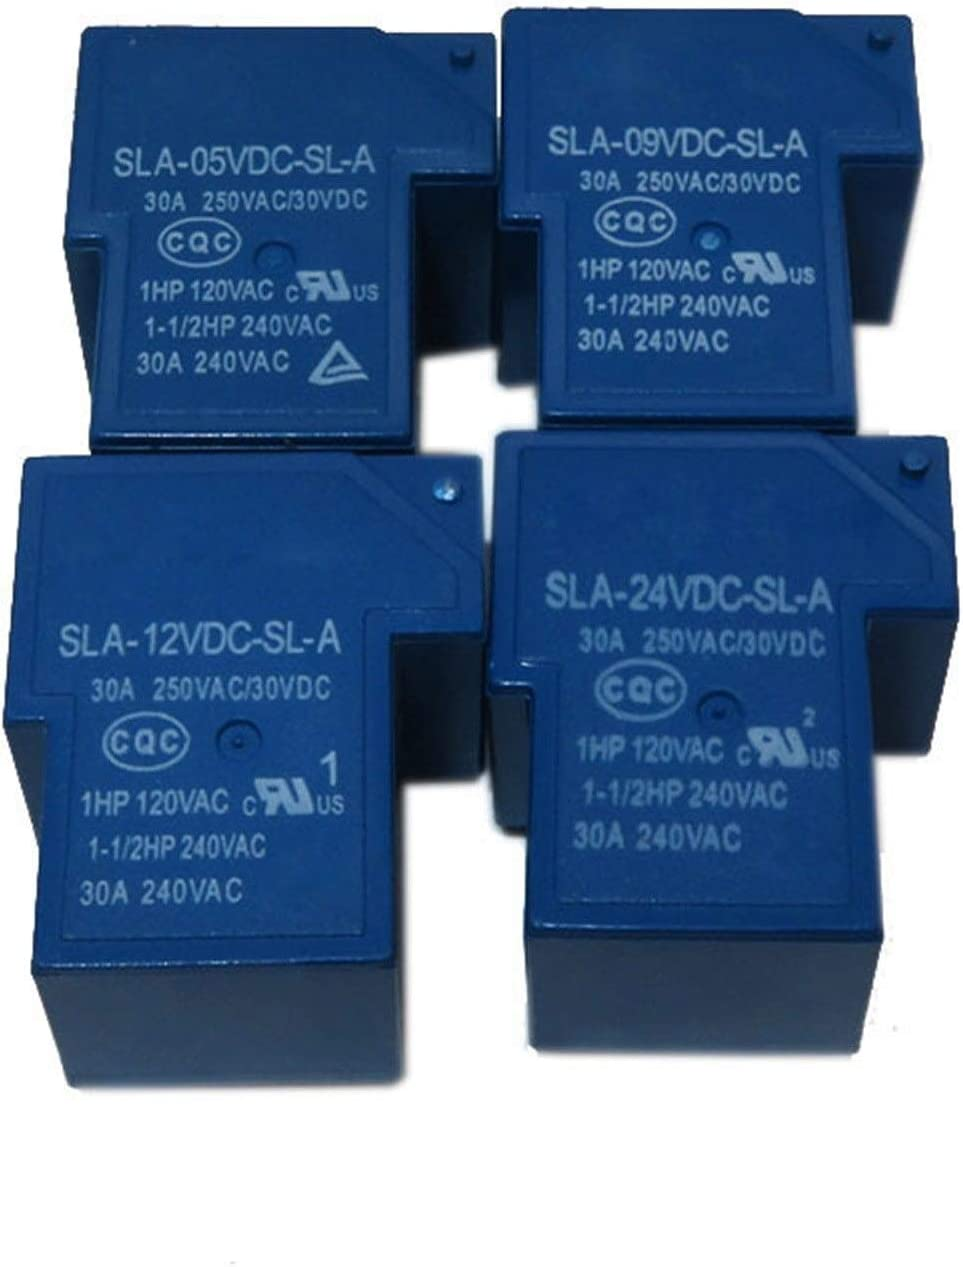 JSJJAES 2 UNIDS Relay SLA-05 09 24 12VDC-SL-A 4PIN 5V 9V 24V 12V SLA-05VDC-SL-A SLA-09VDC-SL-A SLA-12VDC-SL-A (Size : SLA 05VDC SL A 4P)